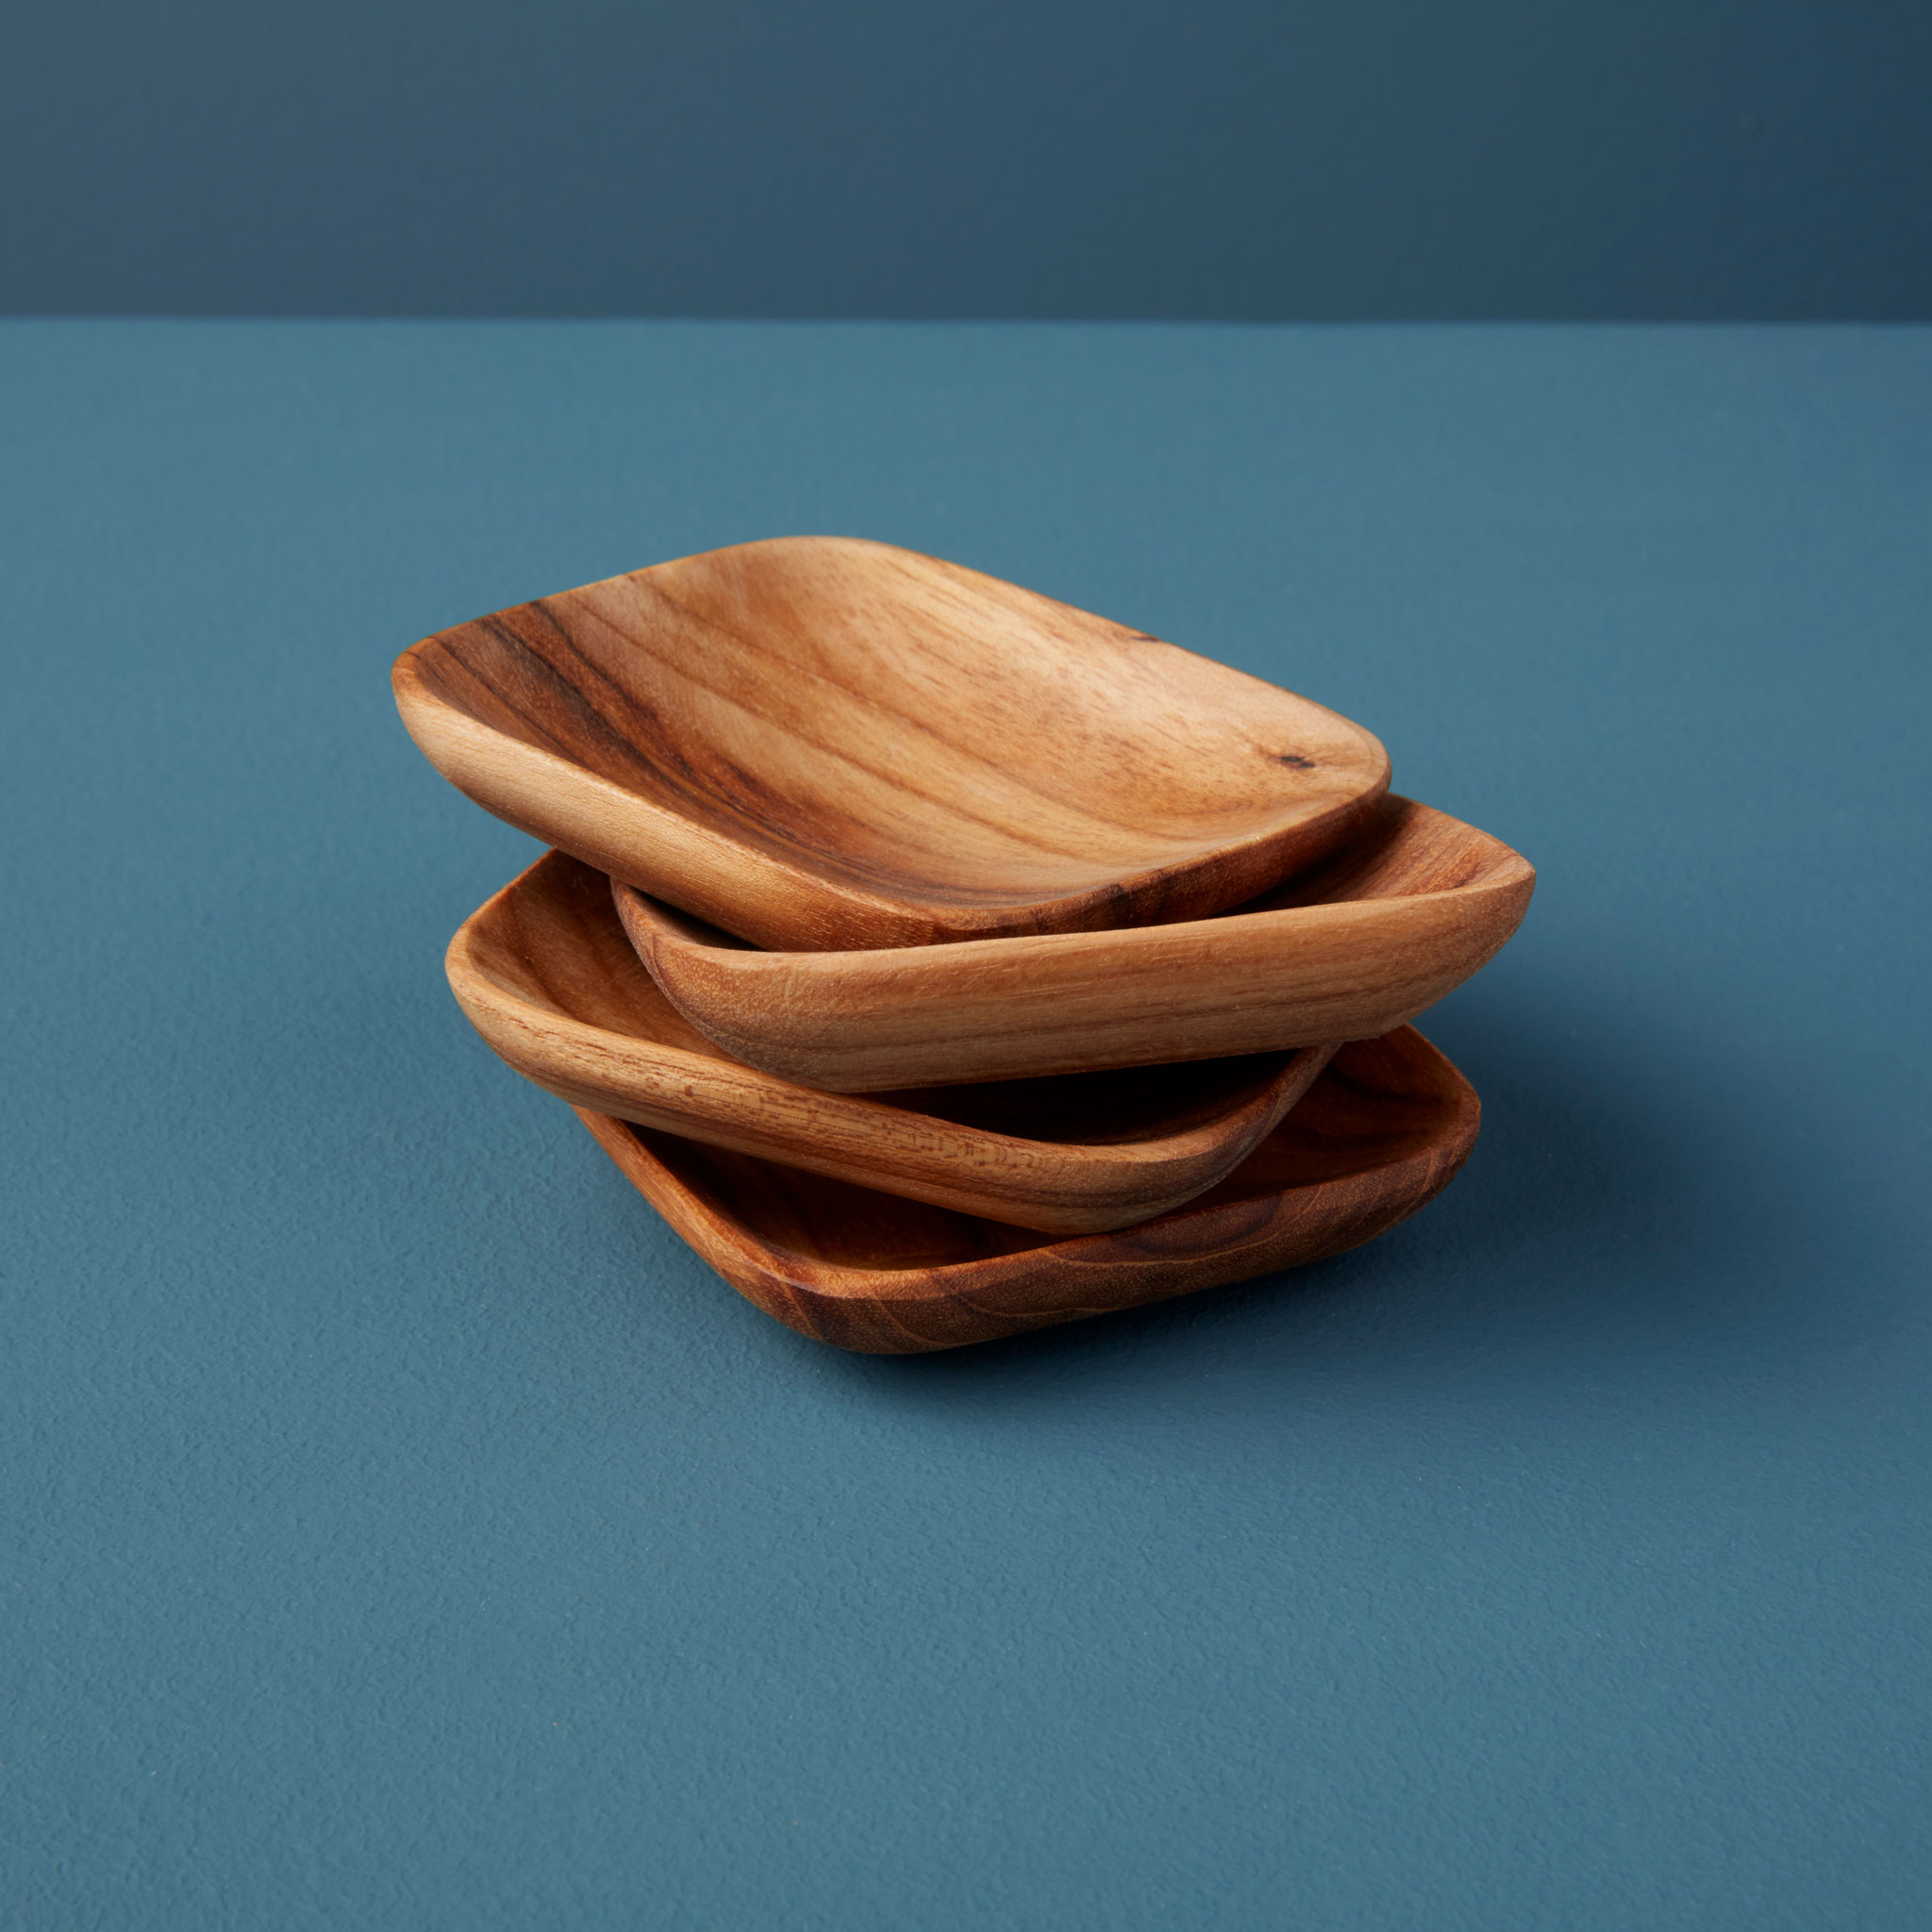 Be-Home_Teak-Square-Bowls-Set-of-4_39-75